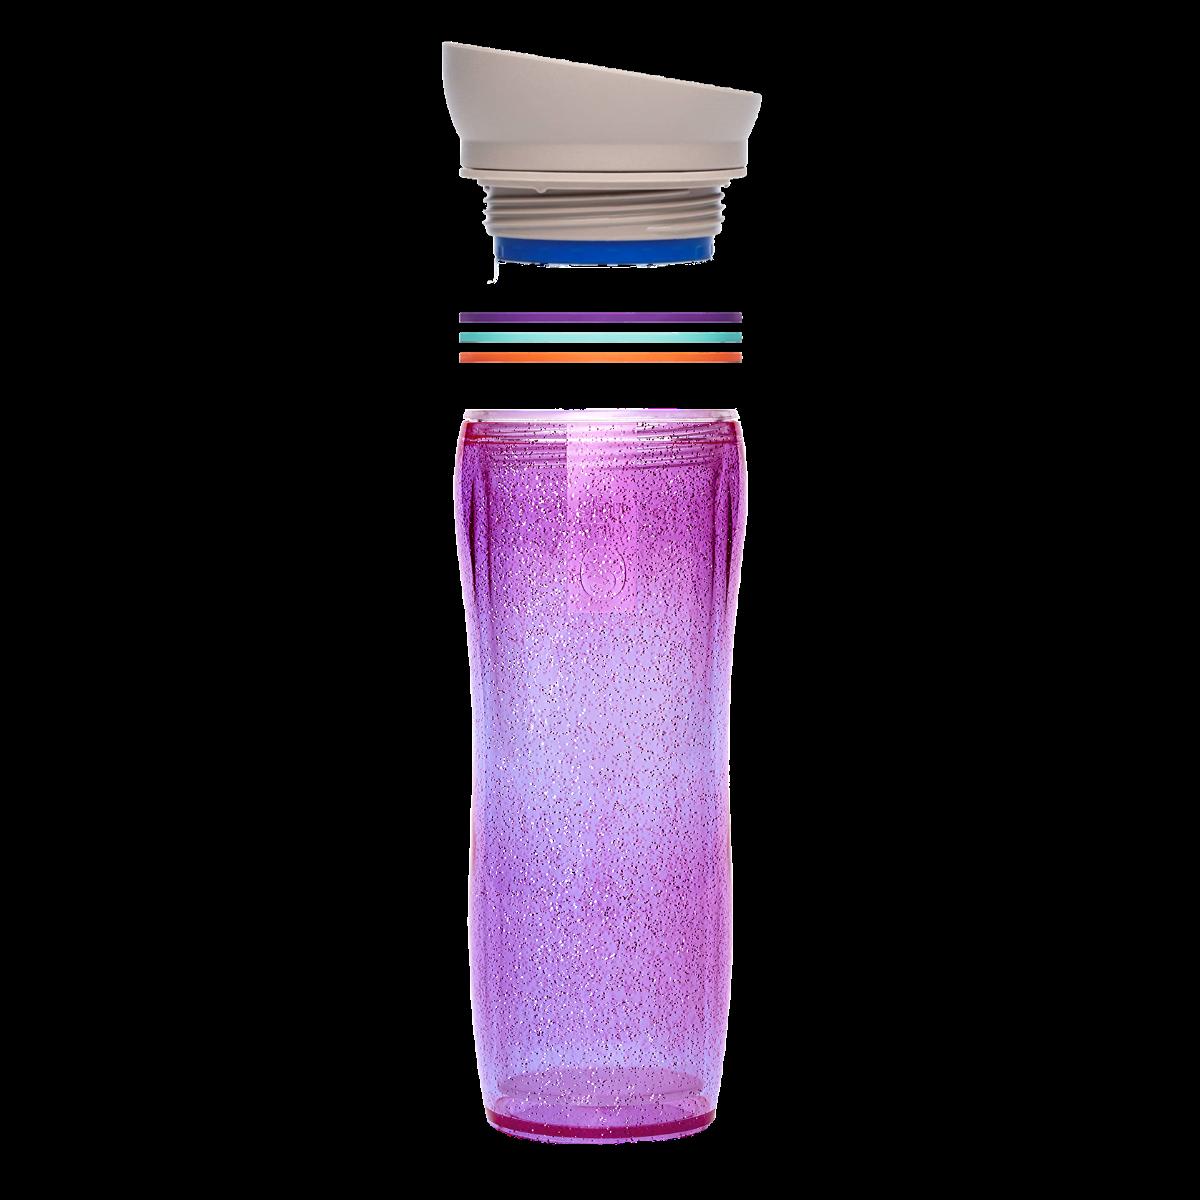 Purple Galaxy Teamaker Jetzt Bei Shuyao Kaufen